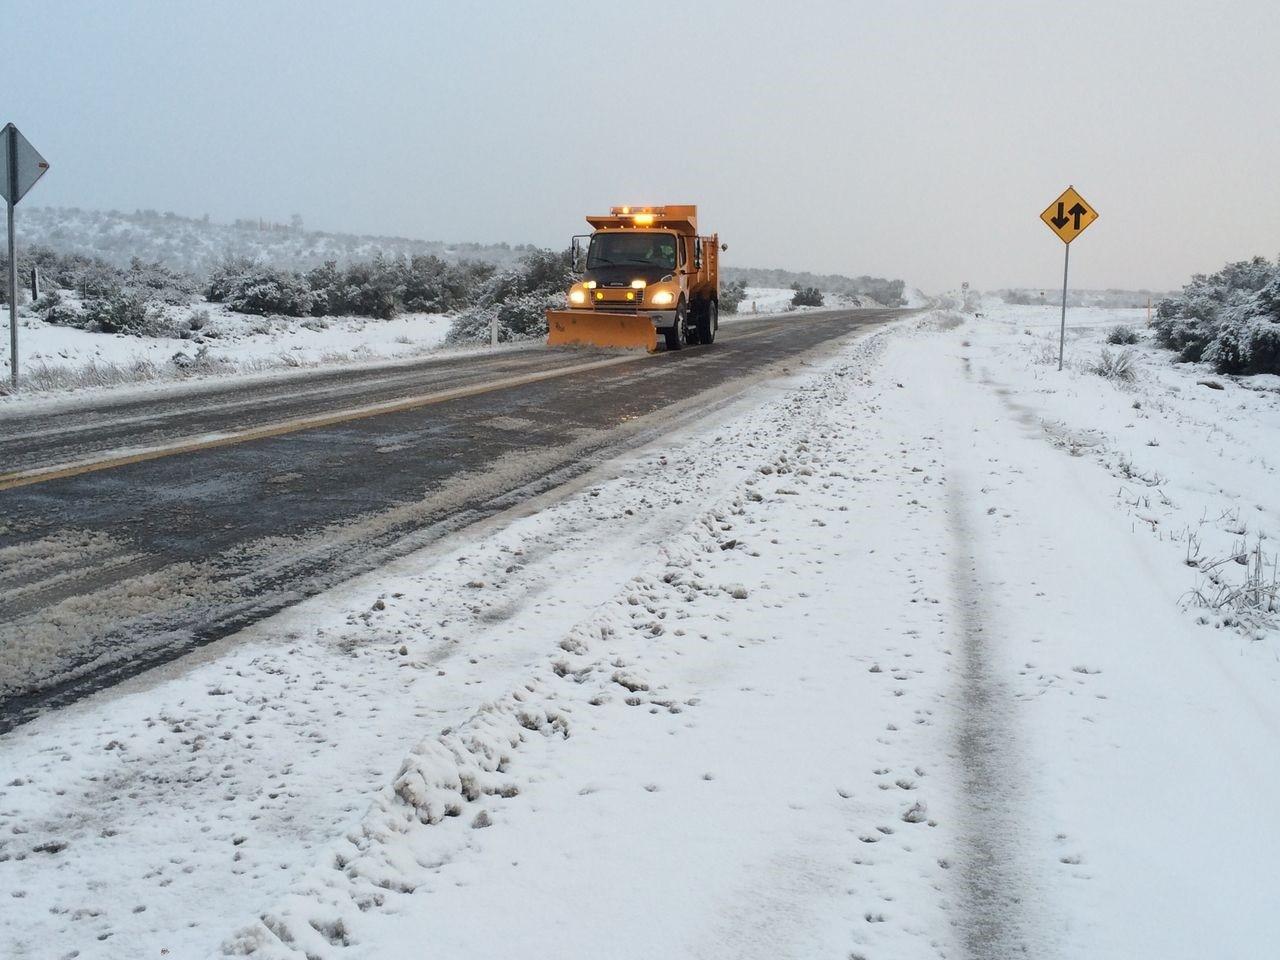 Trabaja SCT en el retiro de nieve en la carretera  Rumorosa – Tecate